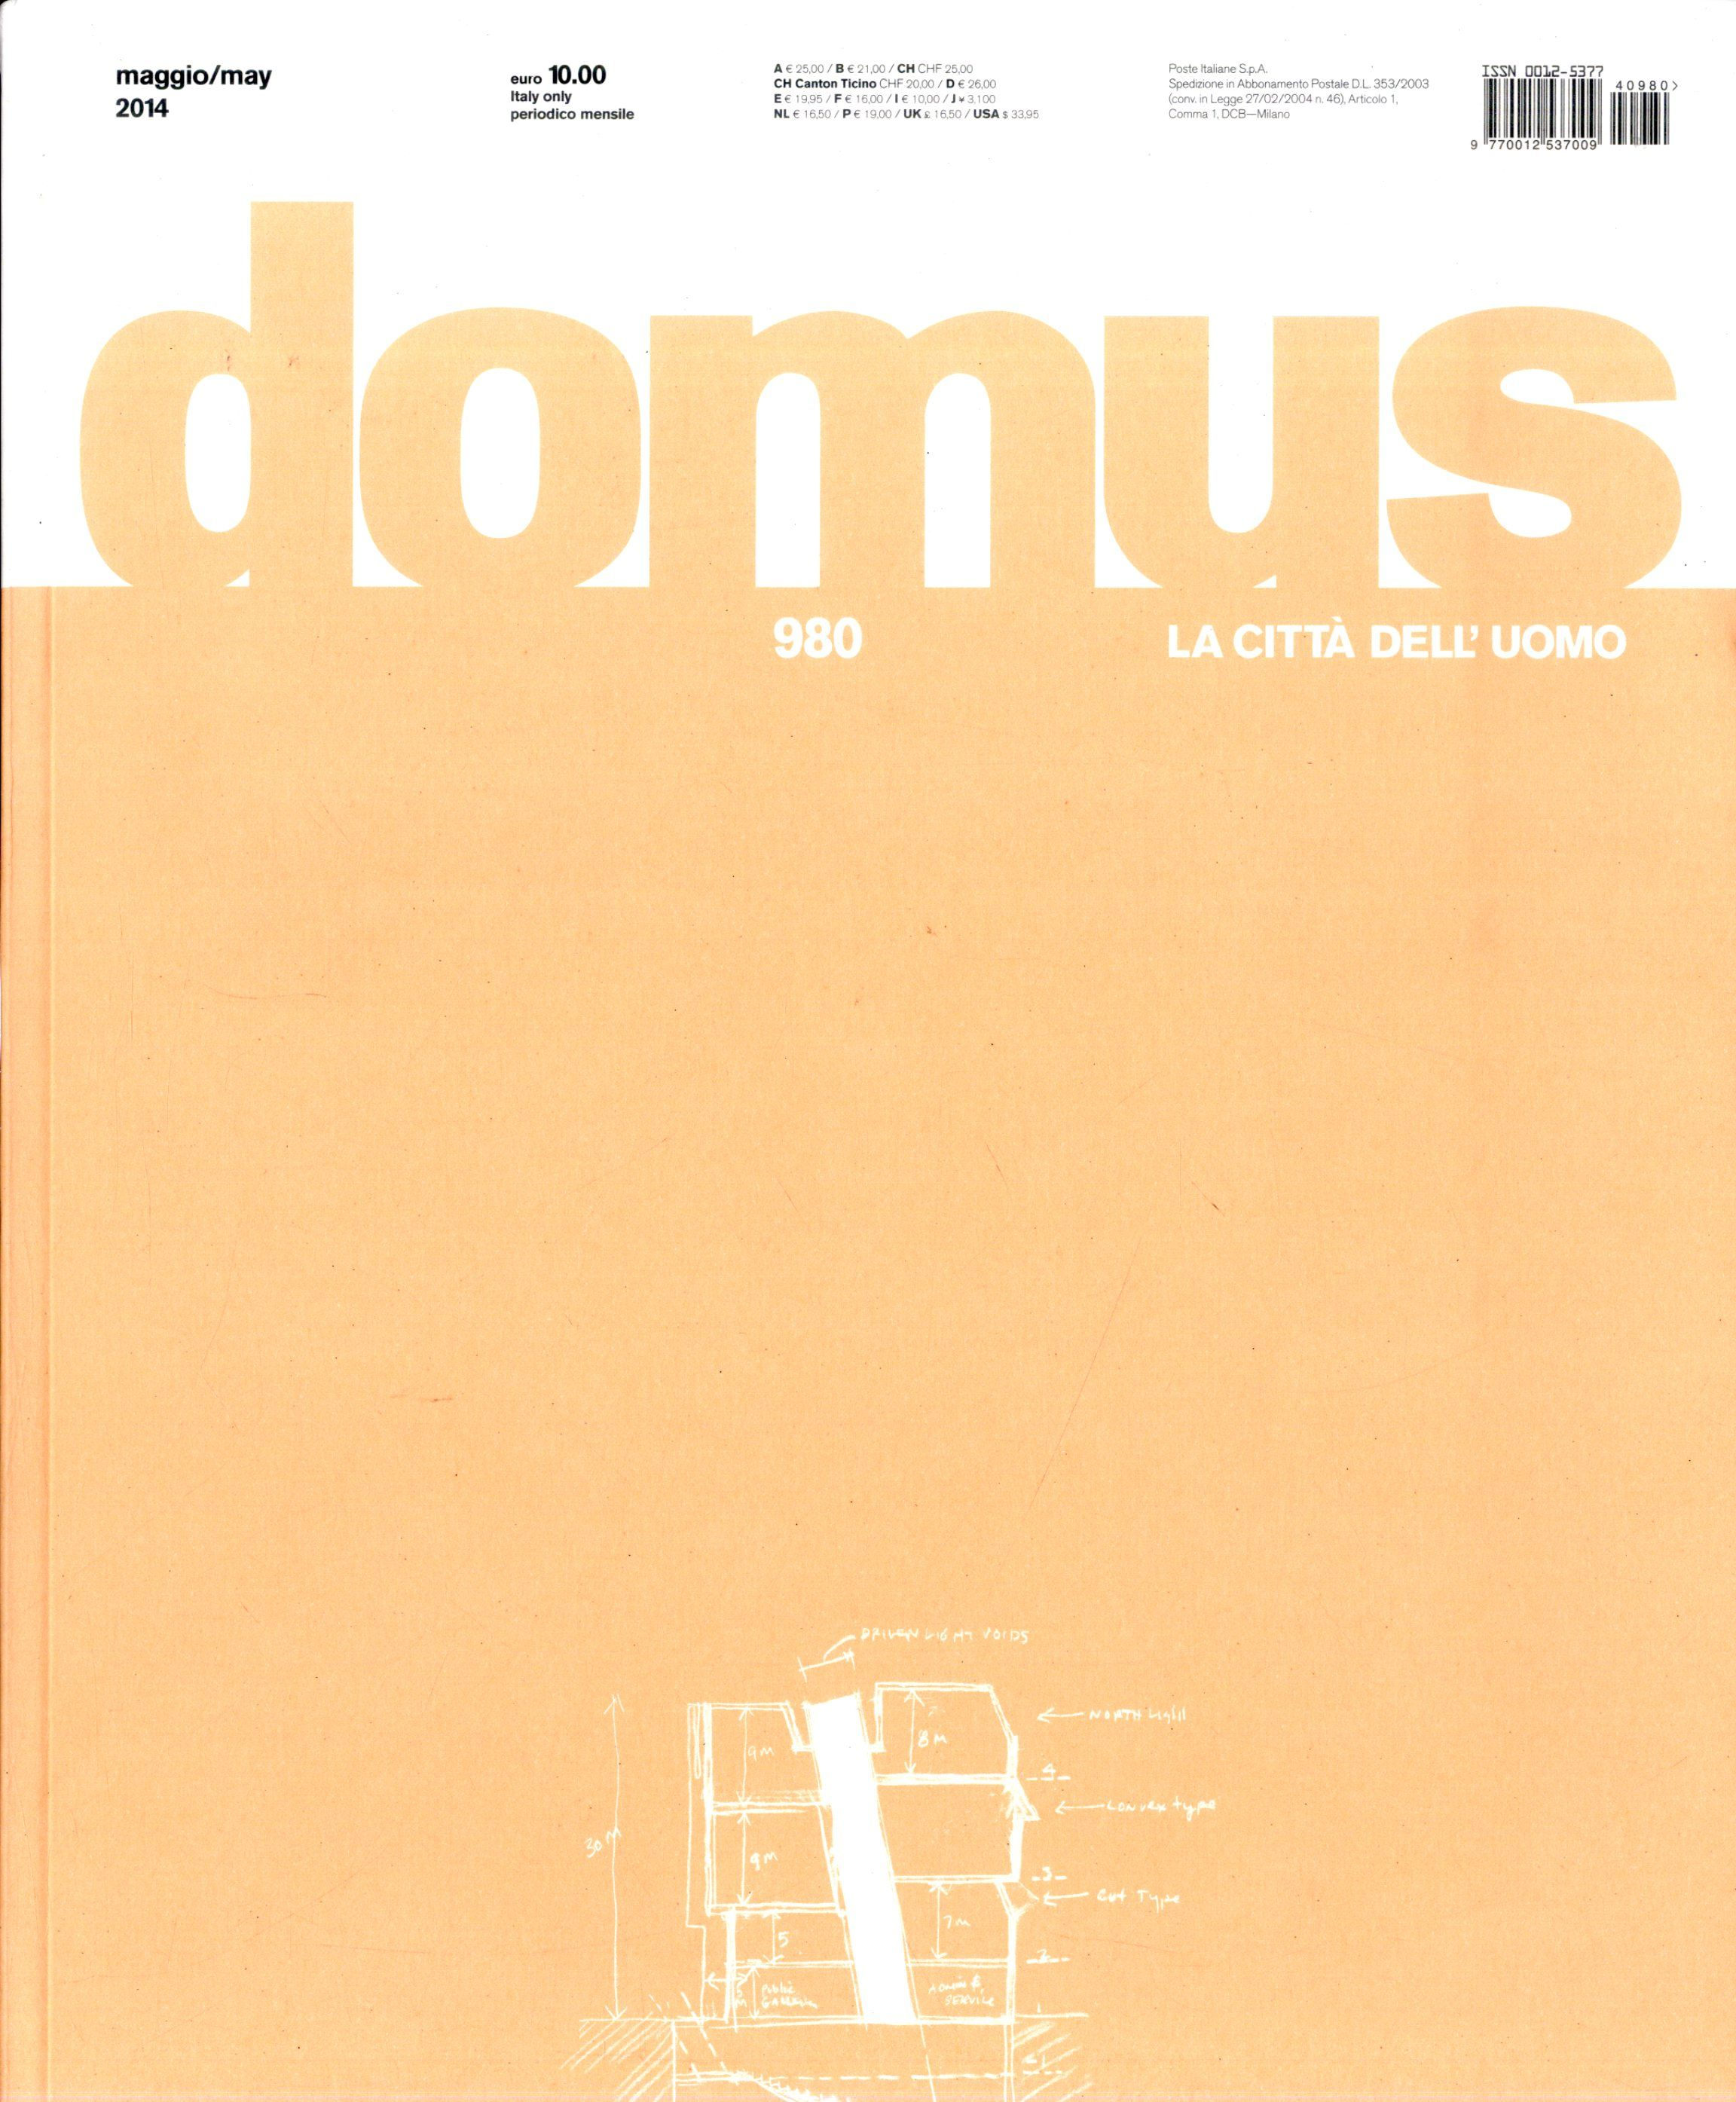 Domus: la città dell'uomo. Nº 980. Maggio 2014. Sumario: http://www.domusweb.it/en/issues/2014/980.html Na biblioteca: http://kmelot.biblioteca.udc.es/record=b1179785~S1*gag